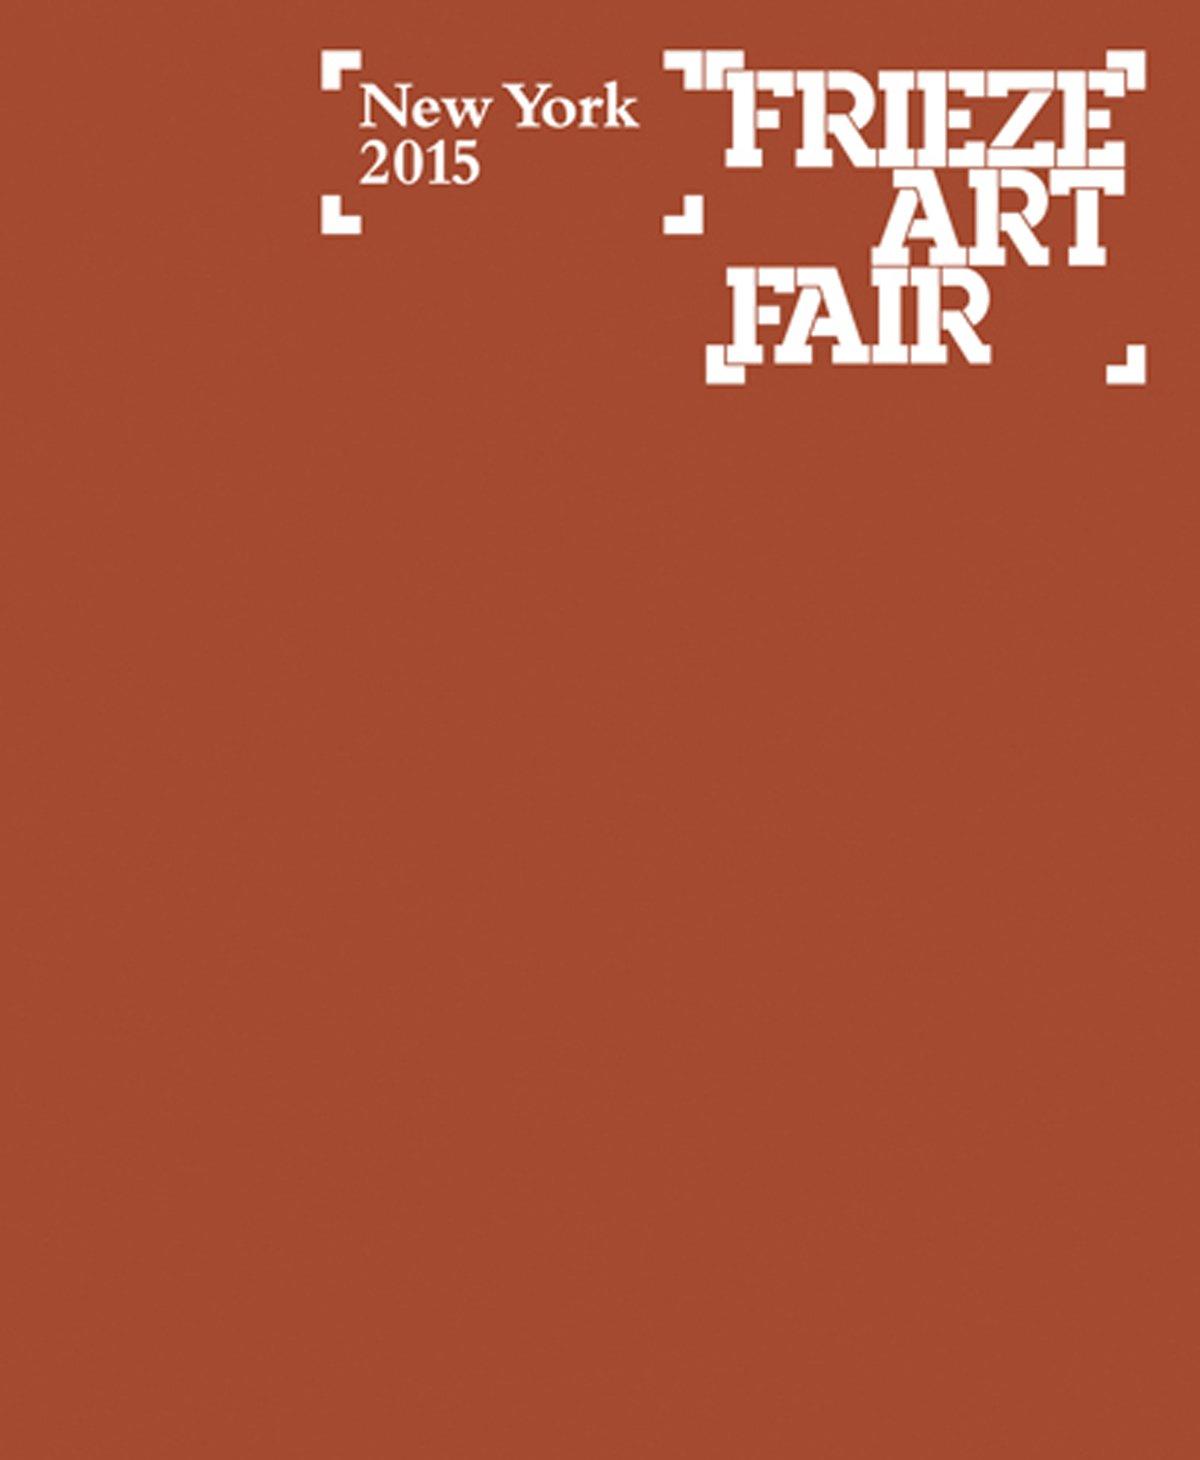 Frieze New York Catalog 2015 (Frieze Art Fair New York) PDF